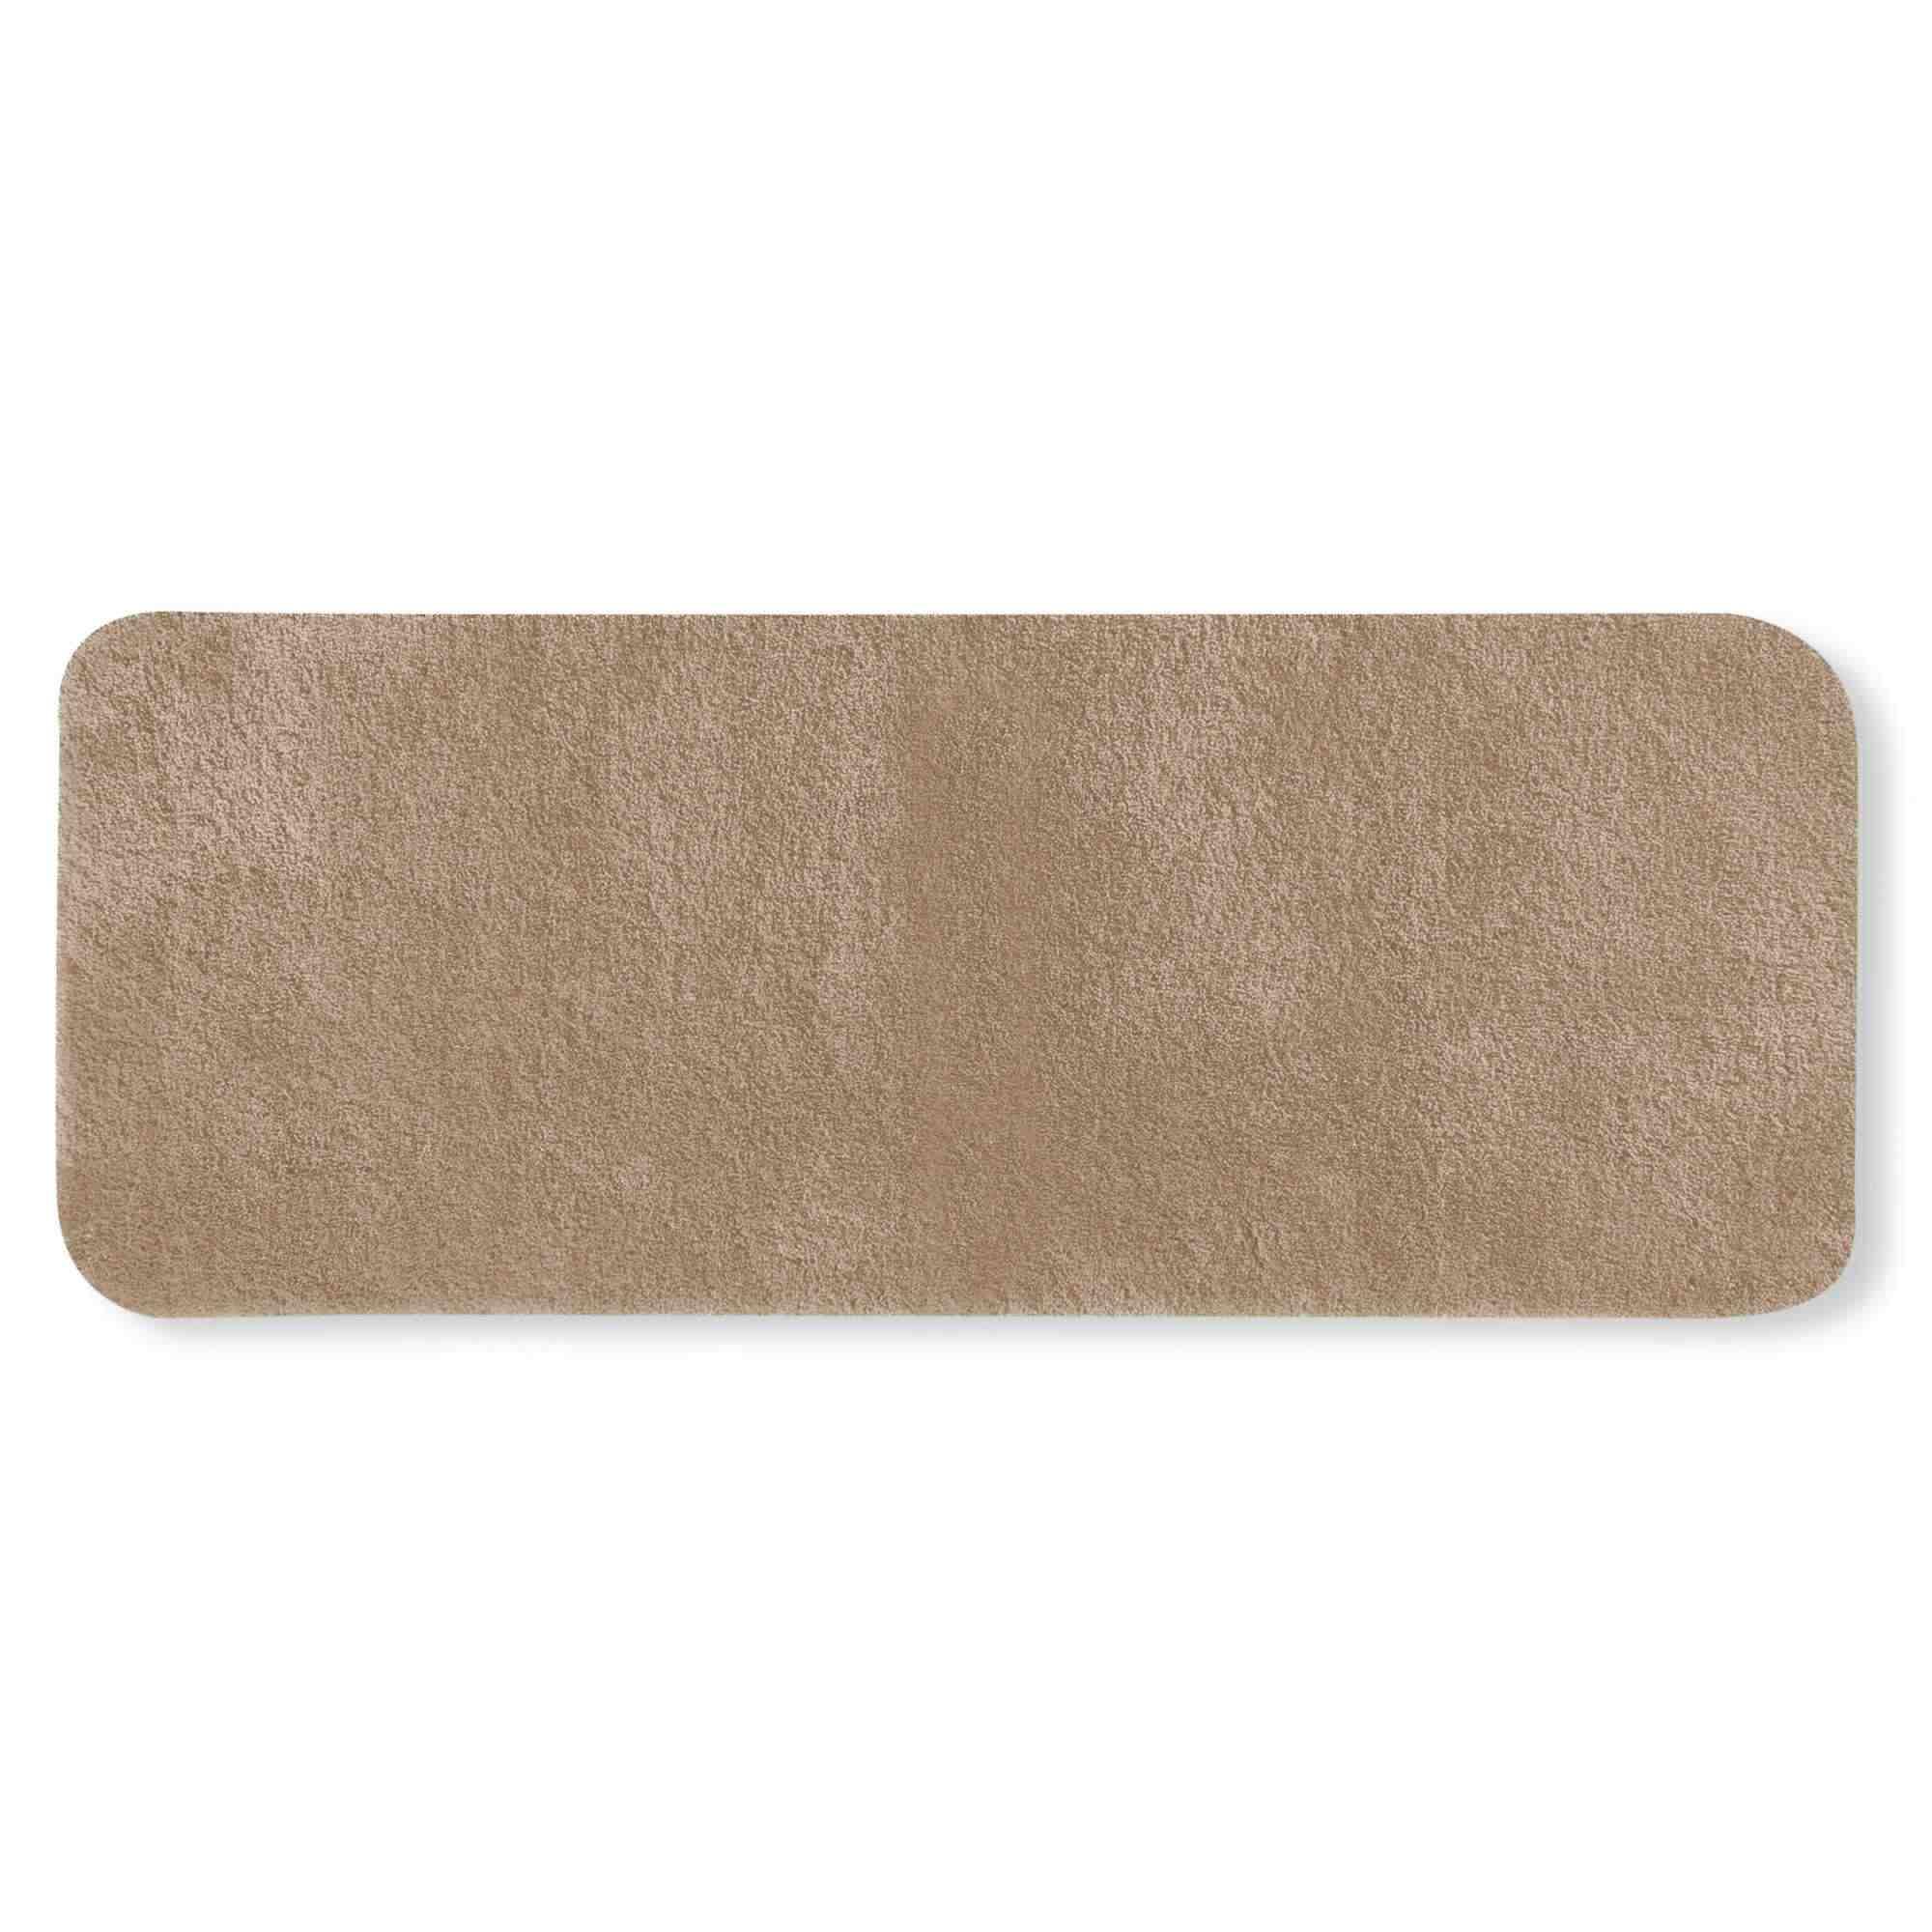 mats bath com floor dp home original mat shower amazon spa the teak kitchen